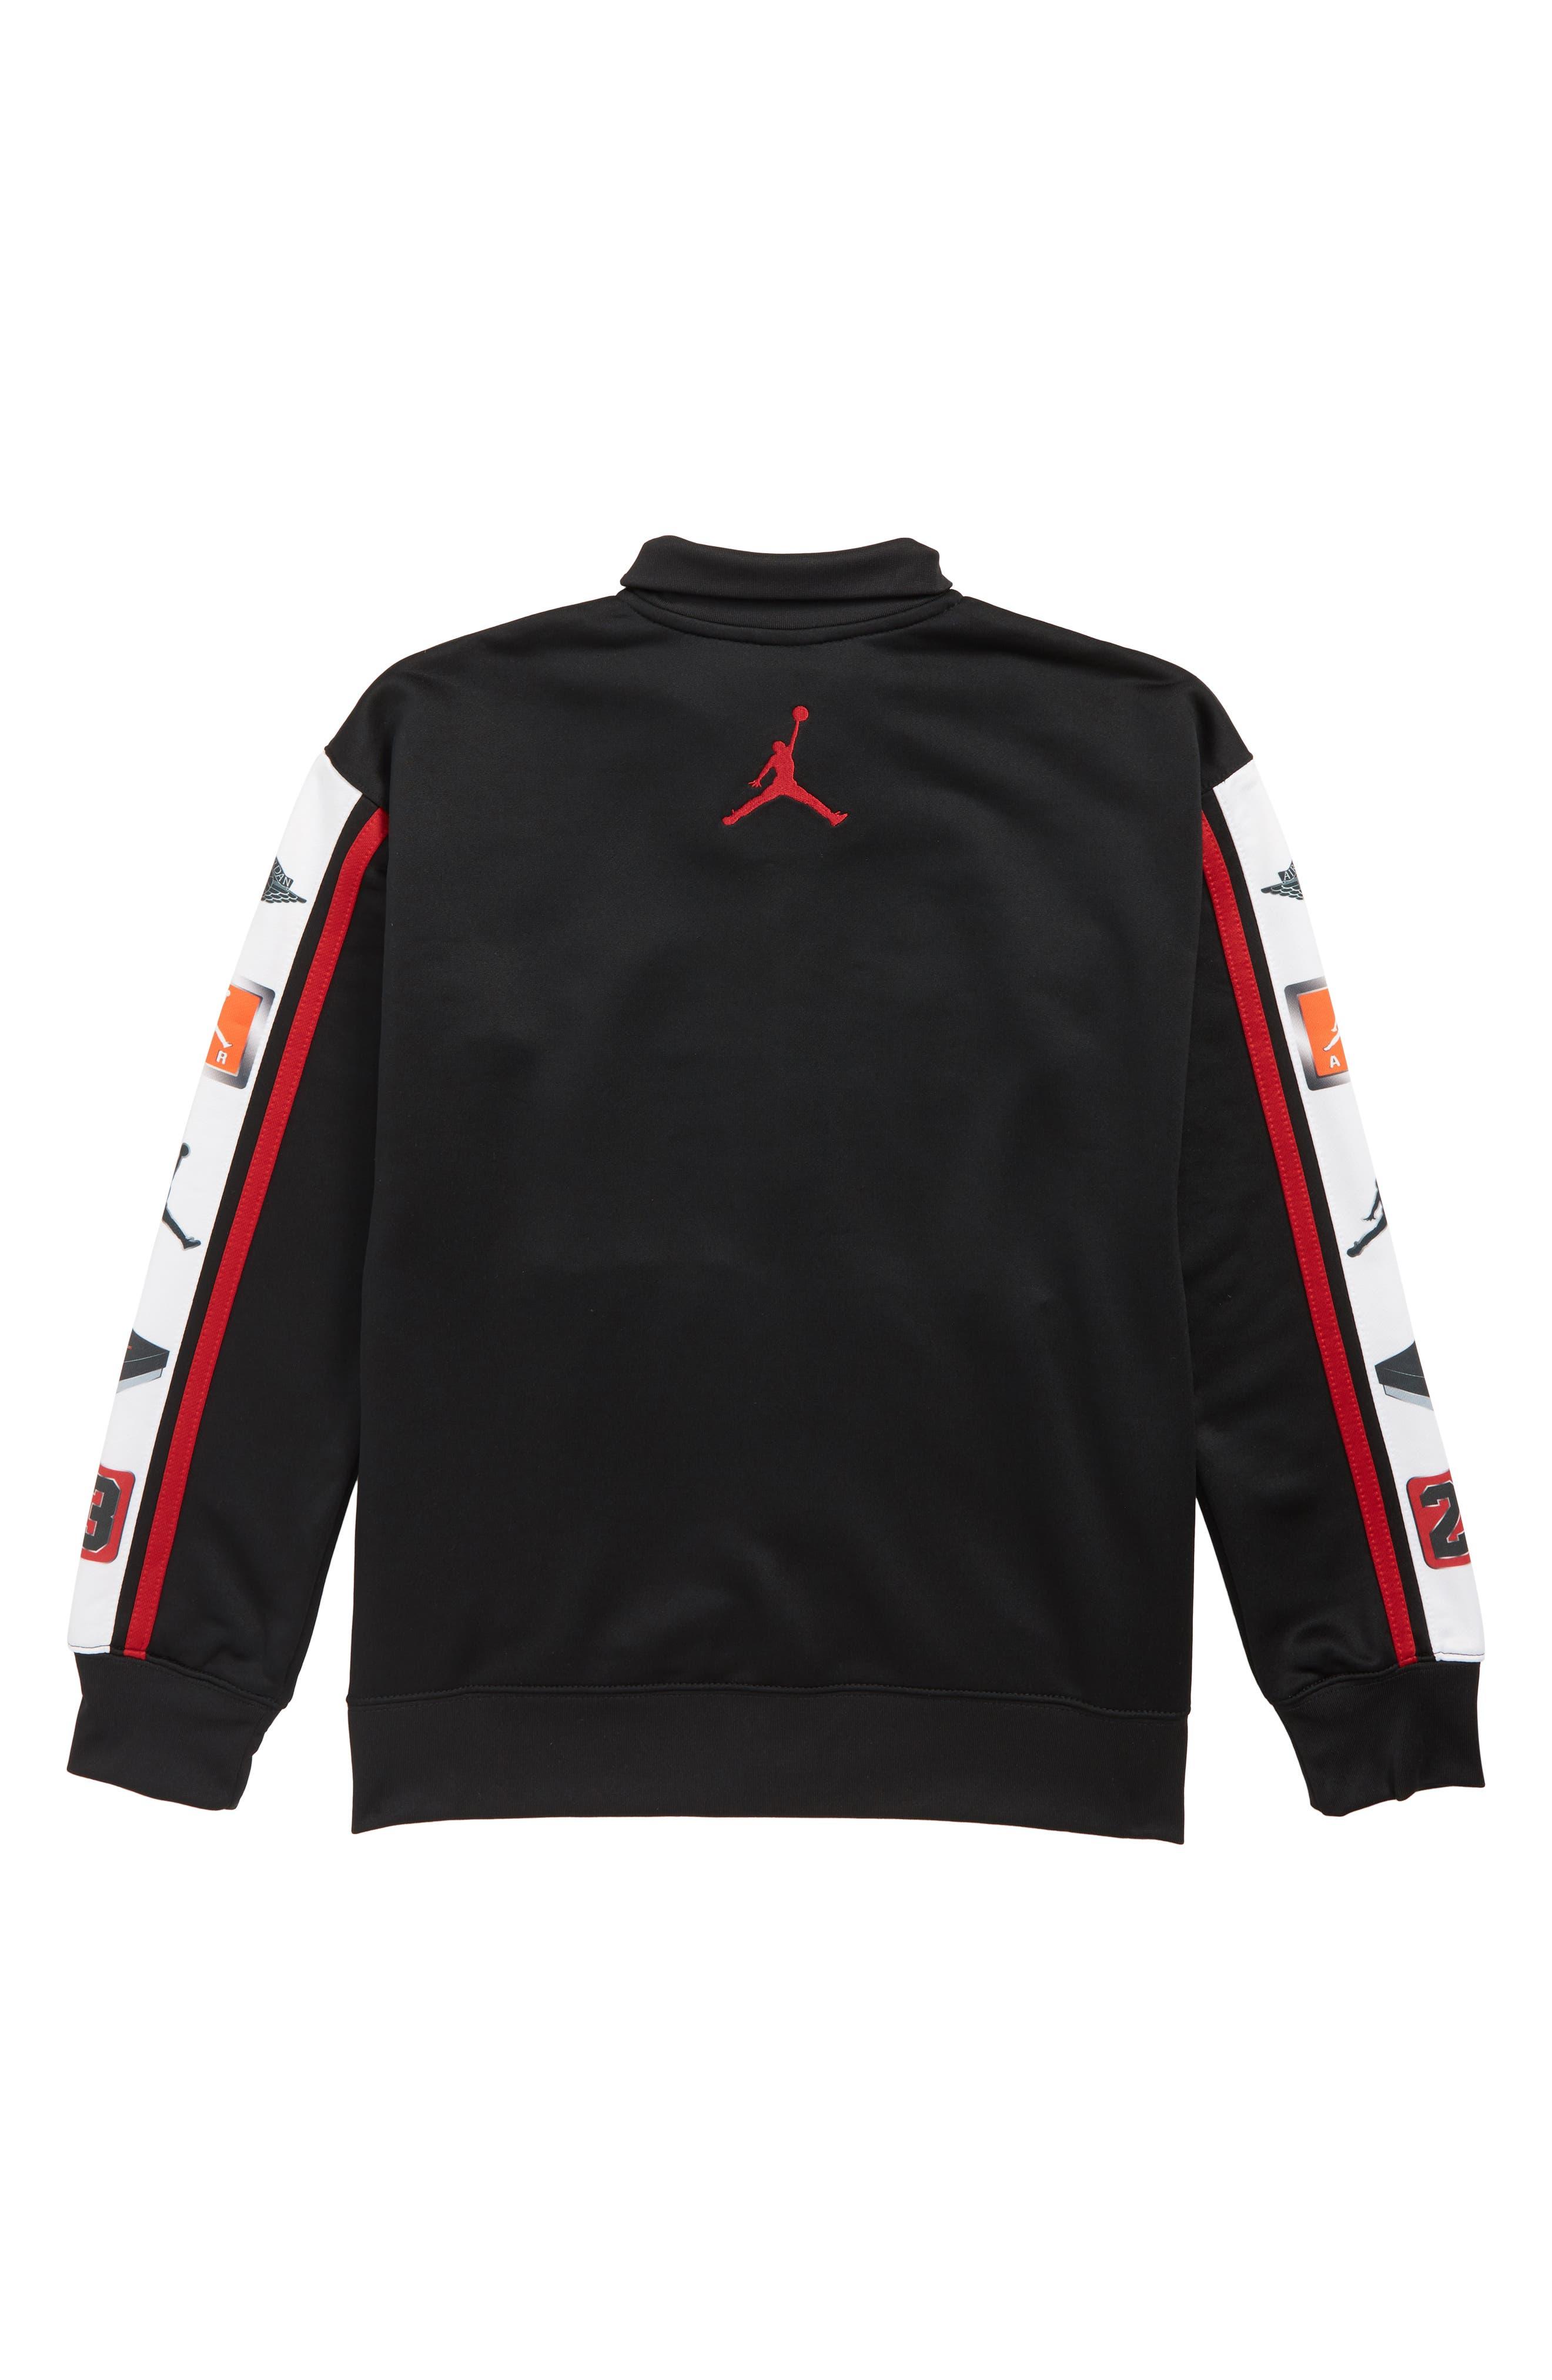 Jordan Celebrity Air Jordan Track Jacket,                             Alternate thumbnail 2, color,                             BLACK